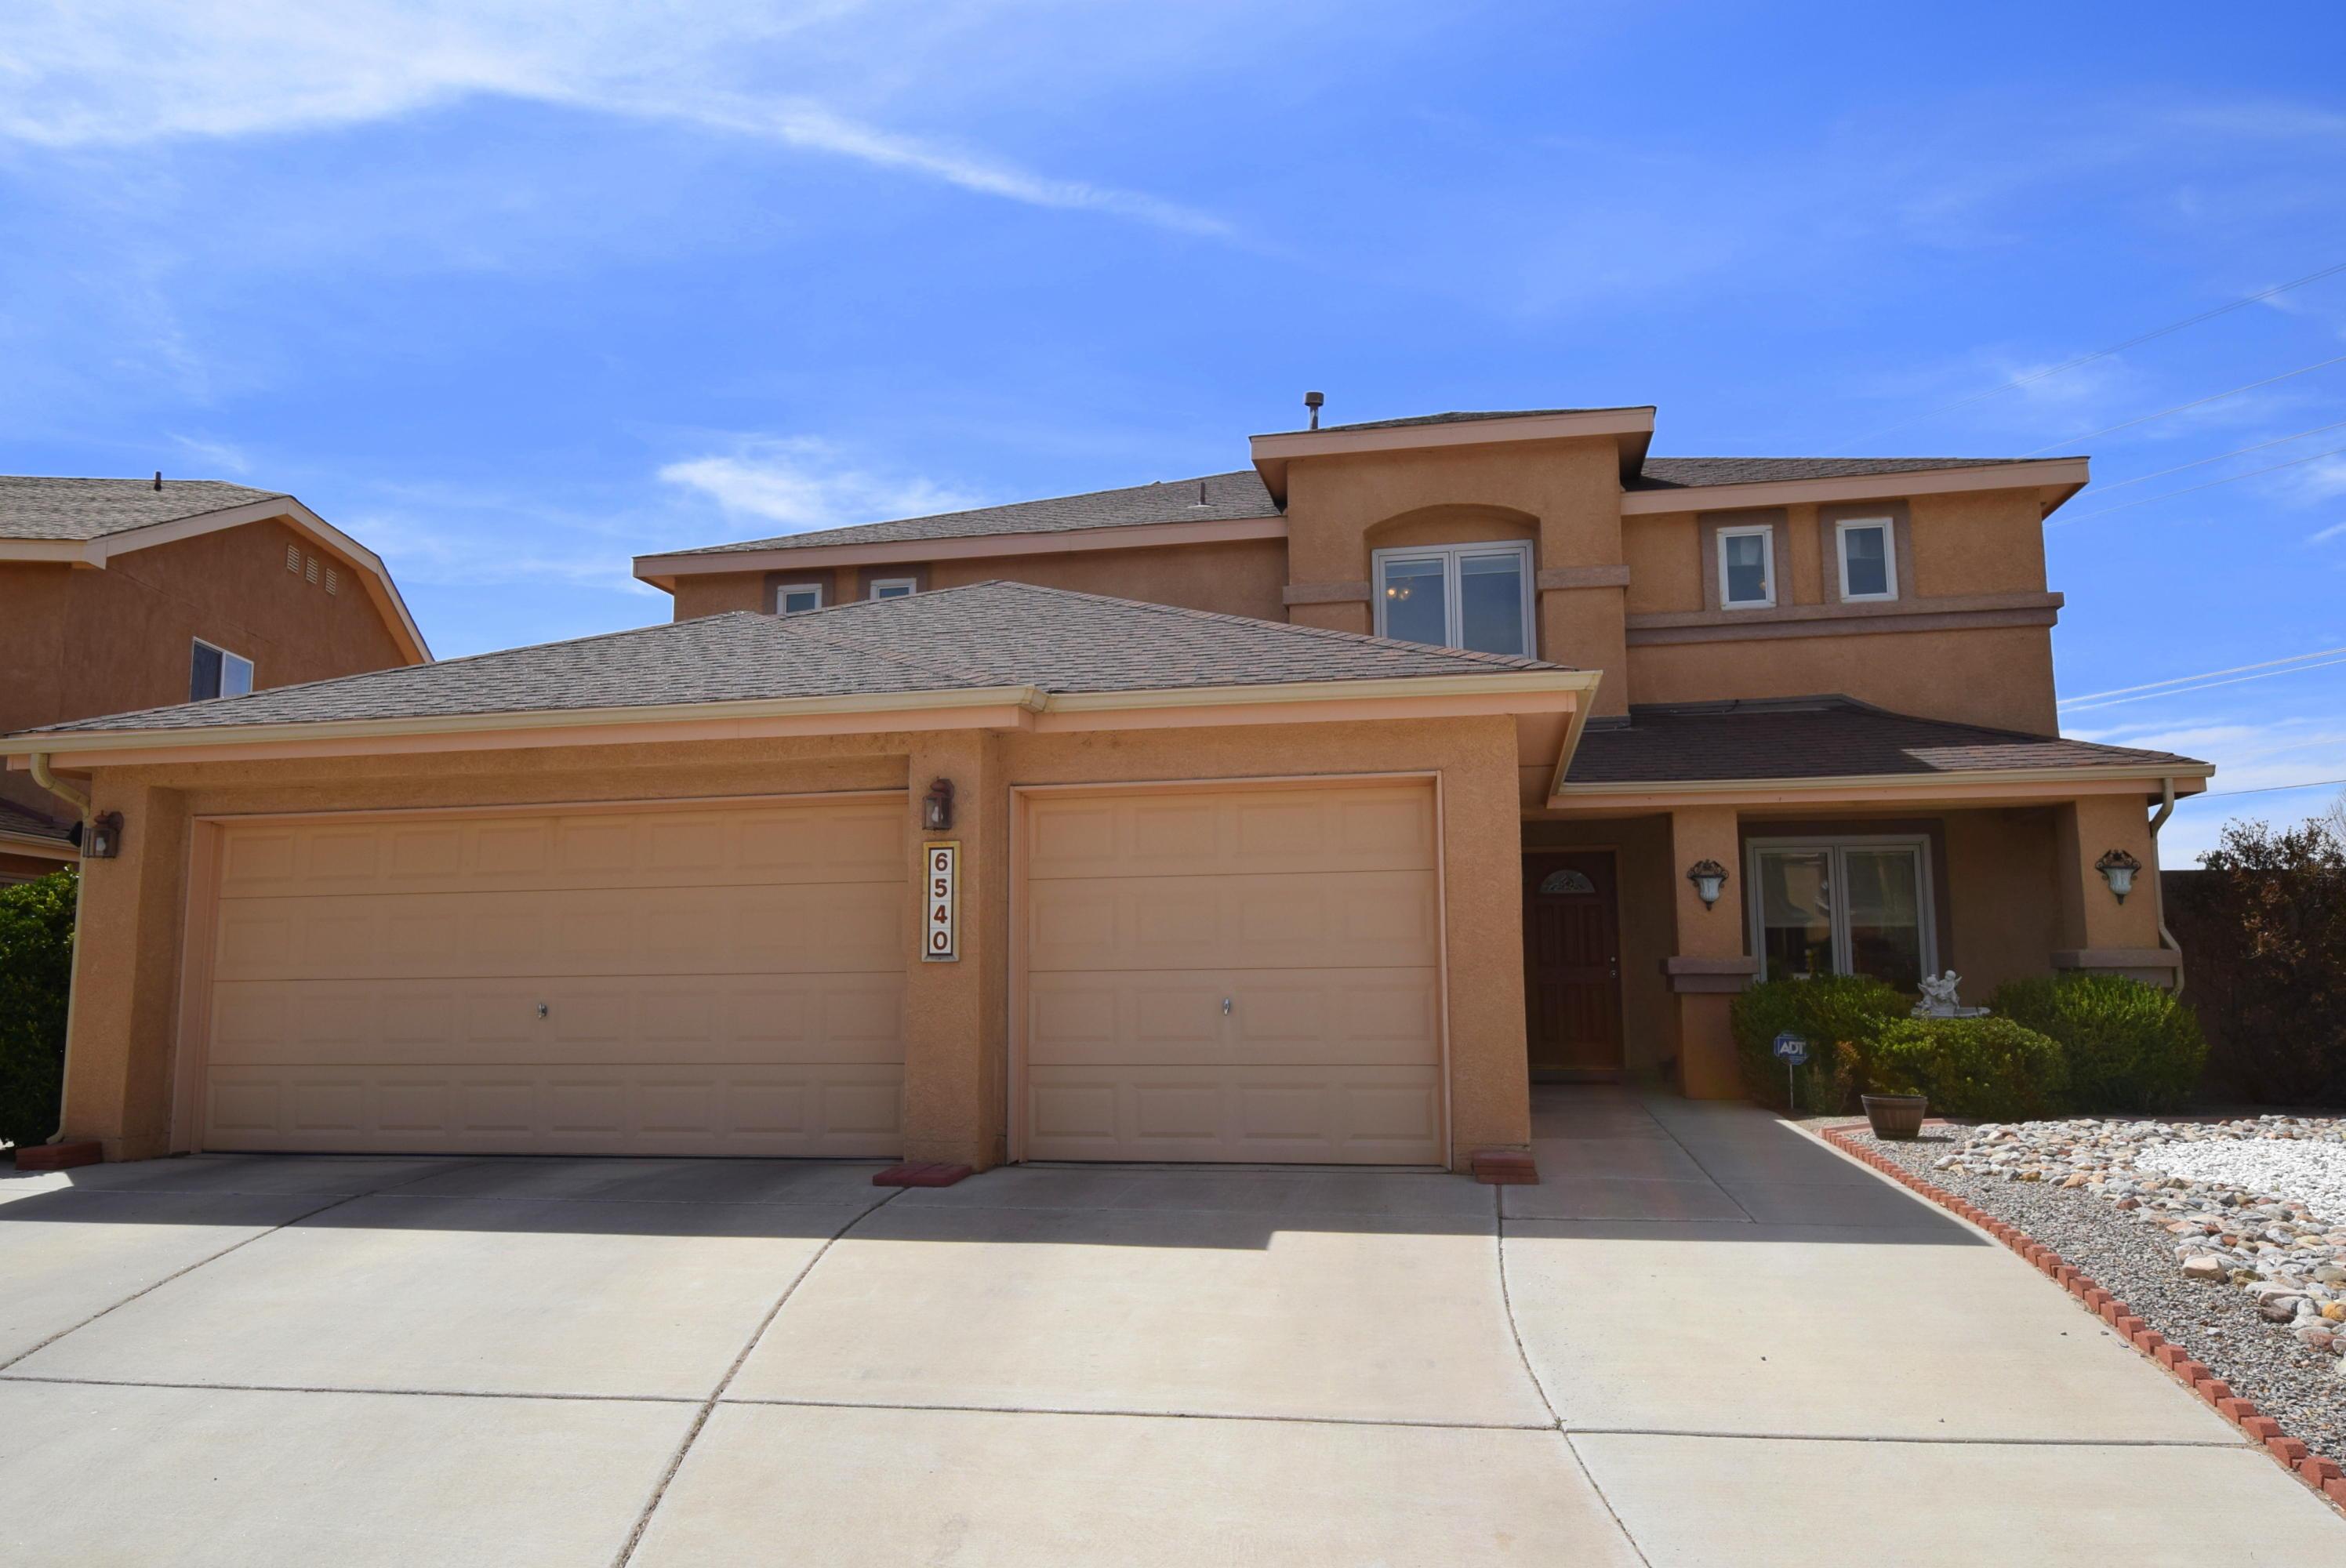 6540 NW Avenida Seville, Northwest Albuquerque and Northwest Heights, New Mexico